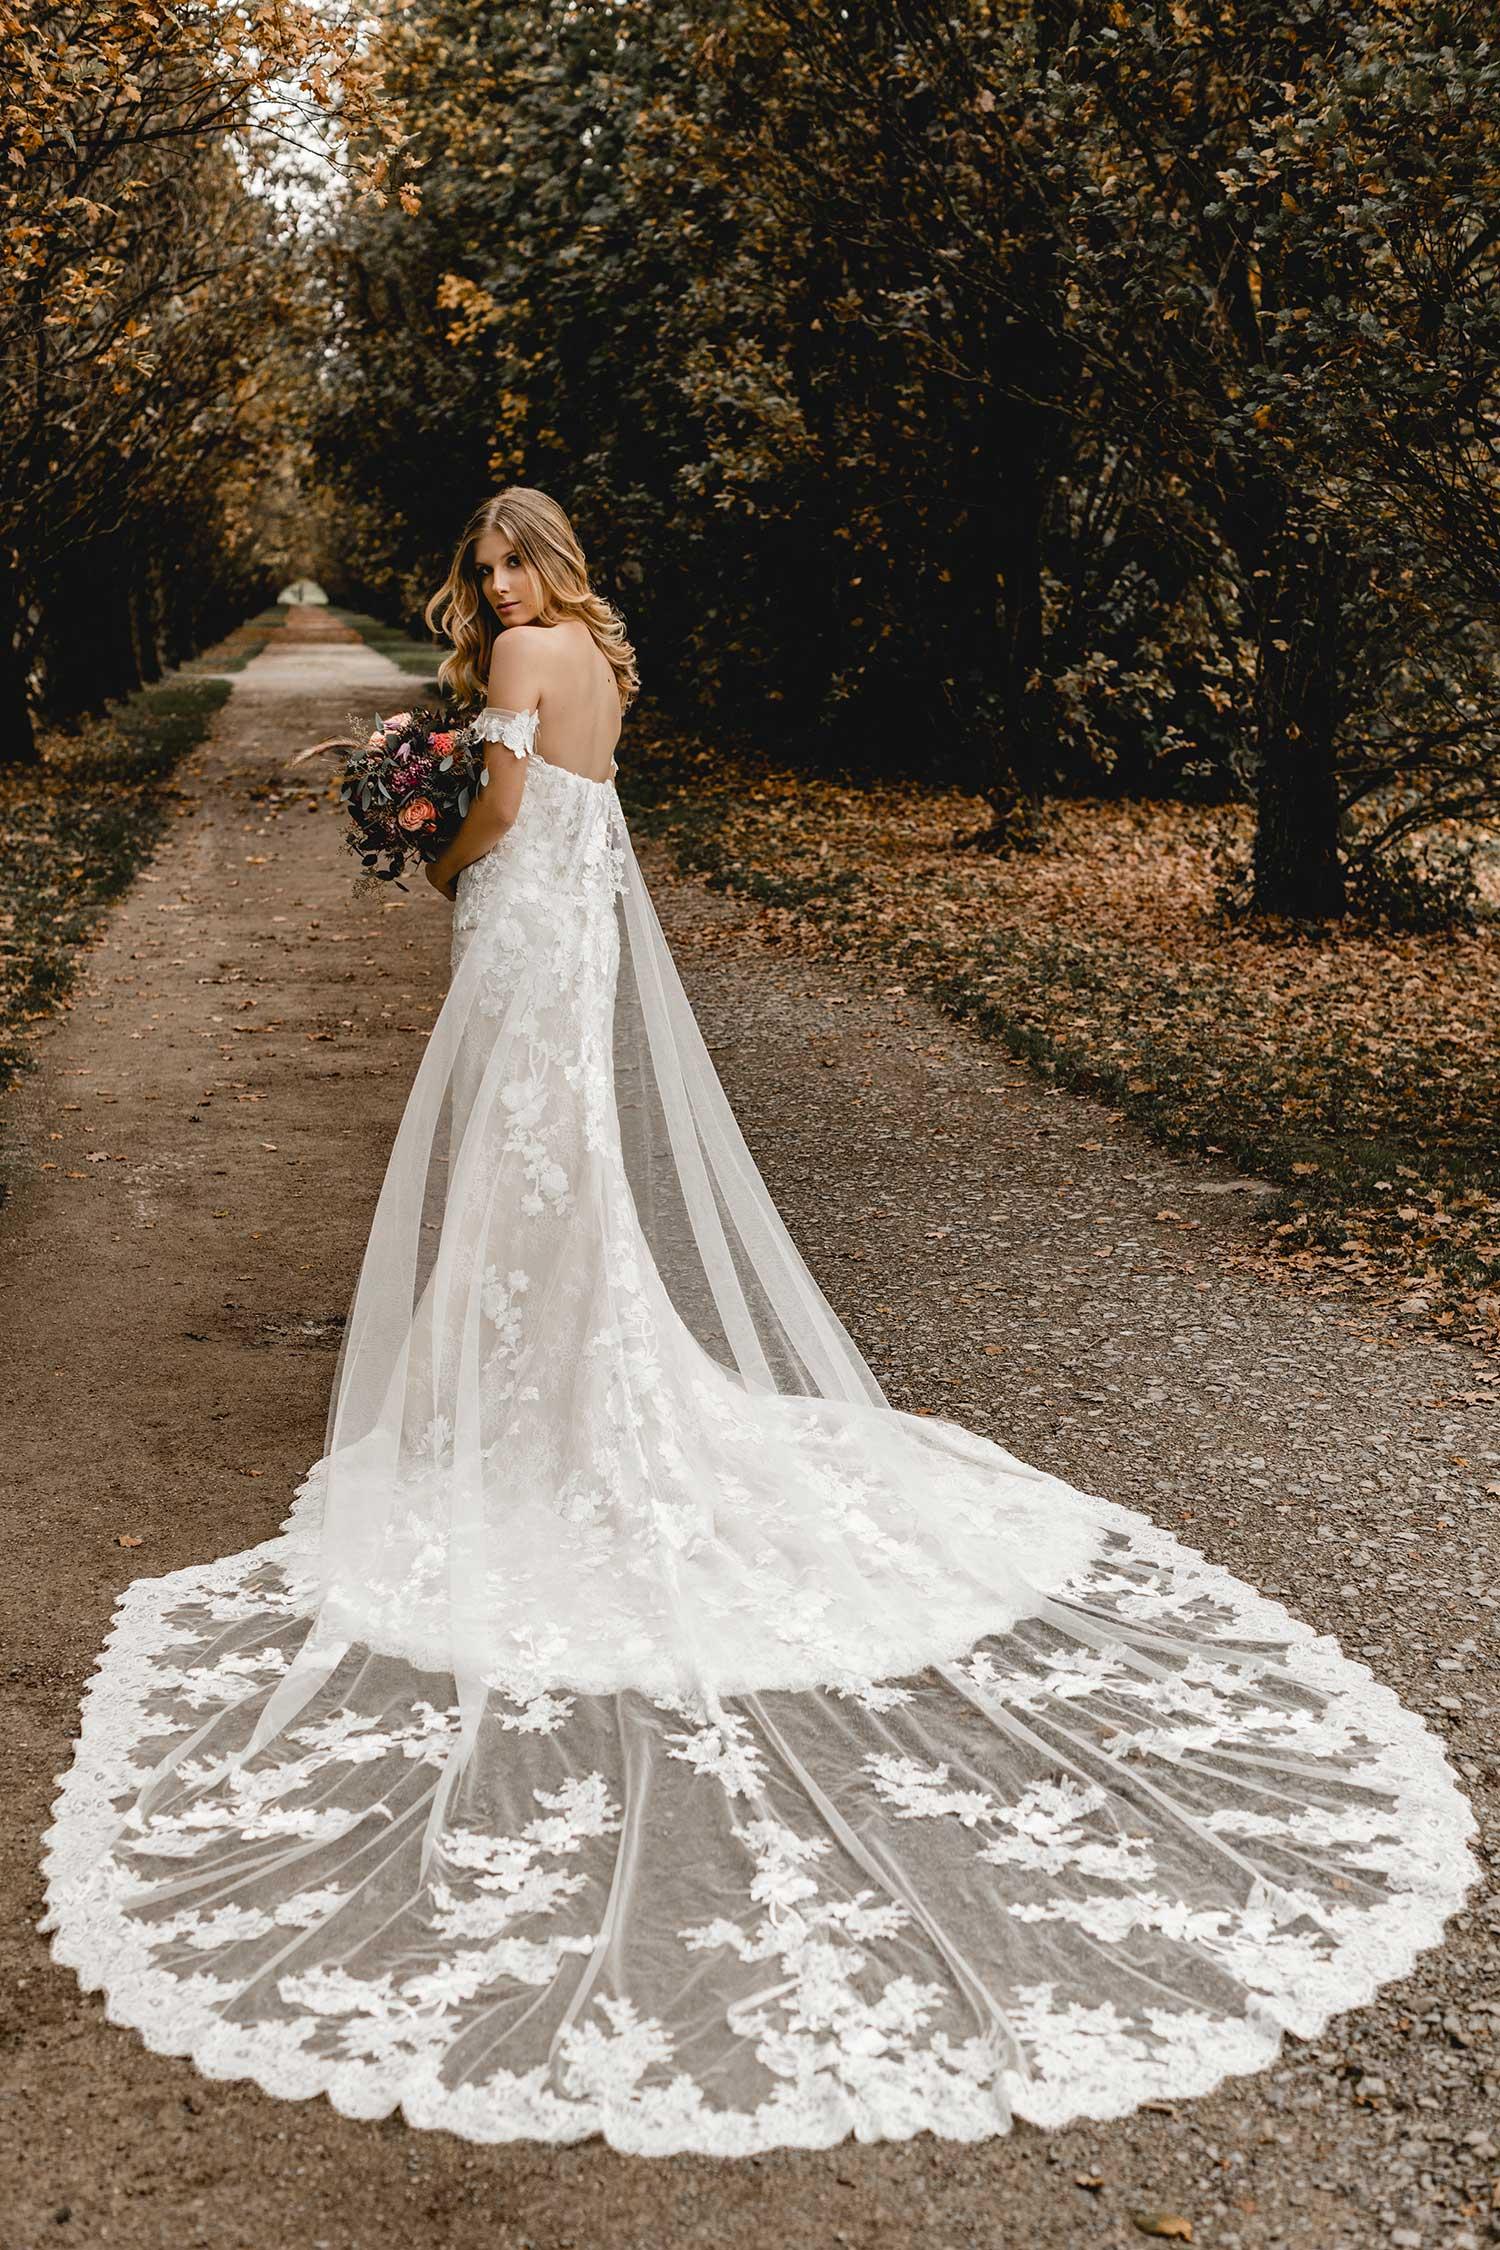 An elegant wedding dress in the park